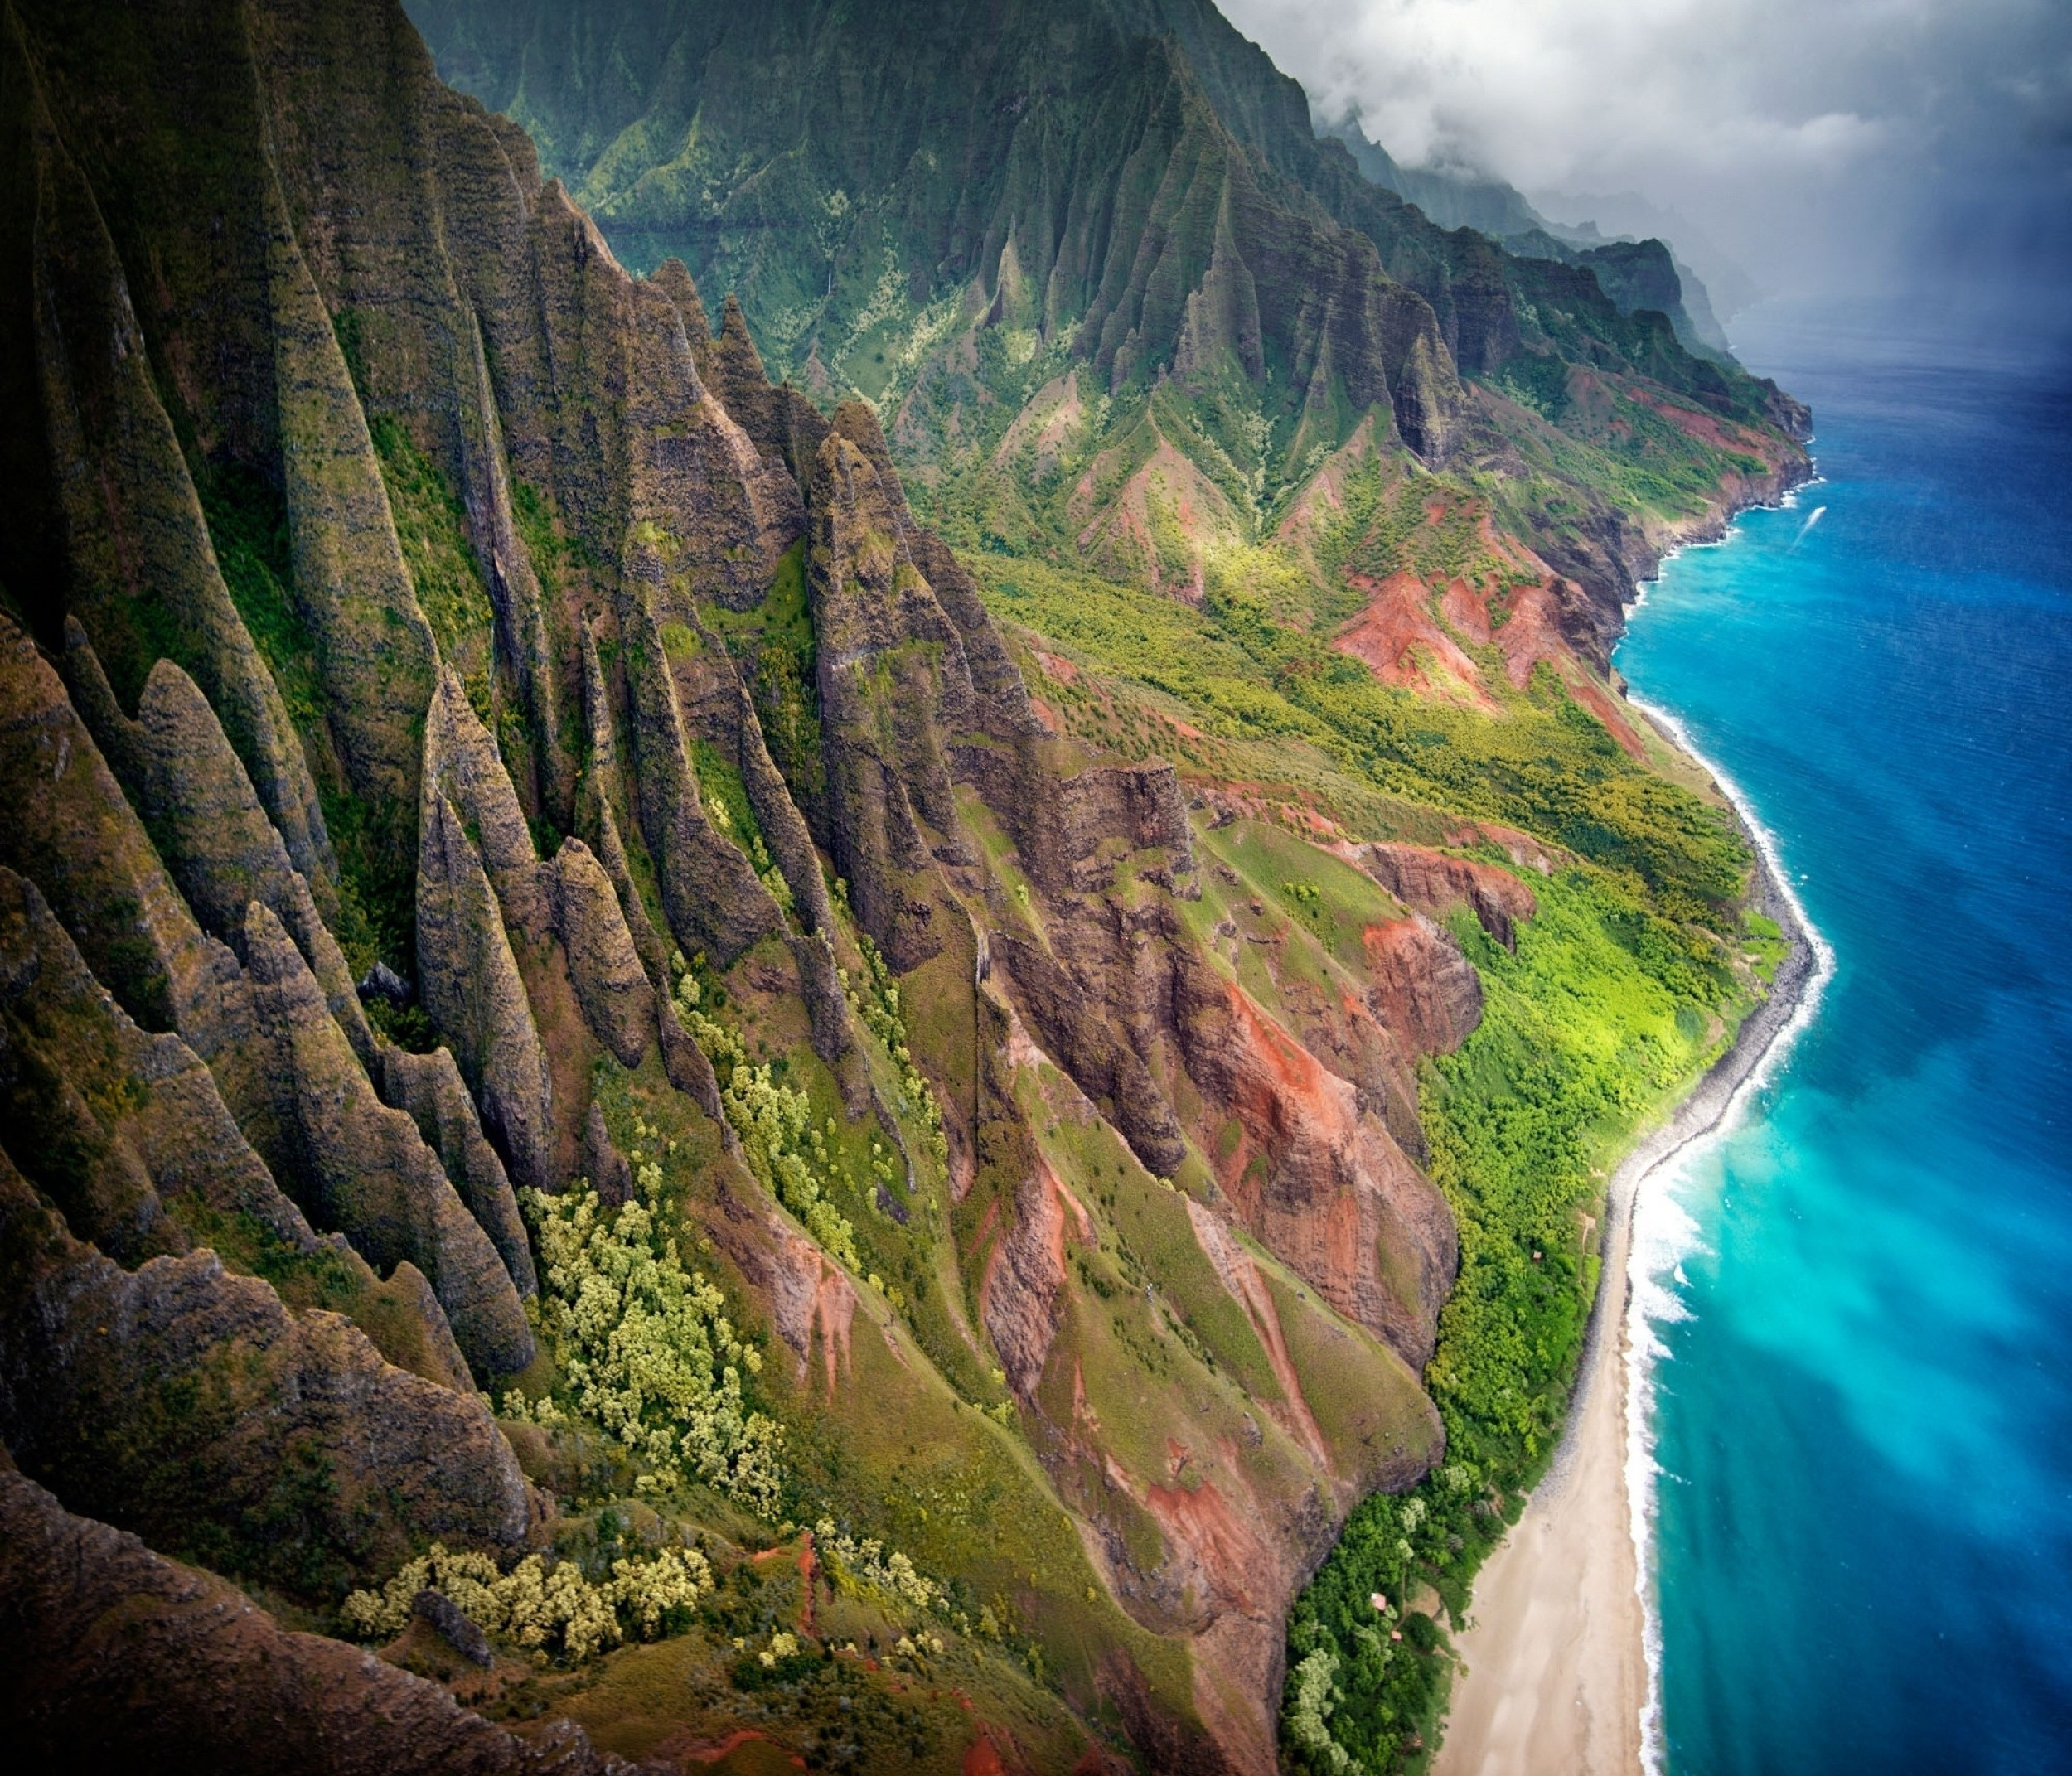 Kauai Wallpapers 54 images 2500x2143